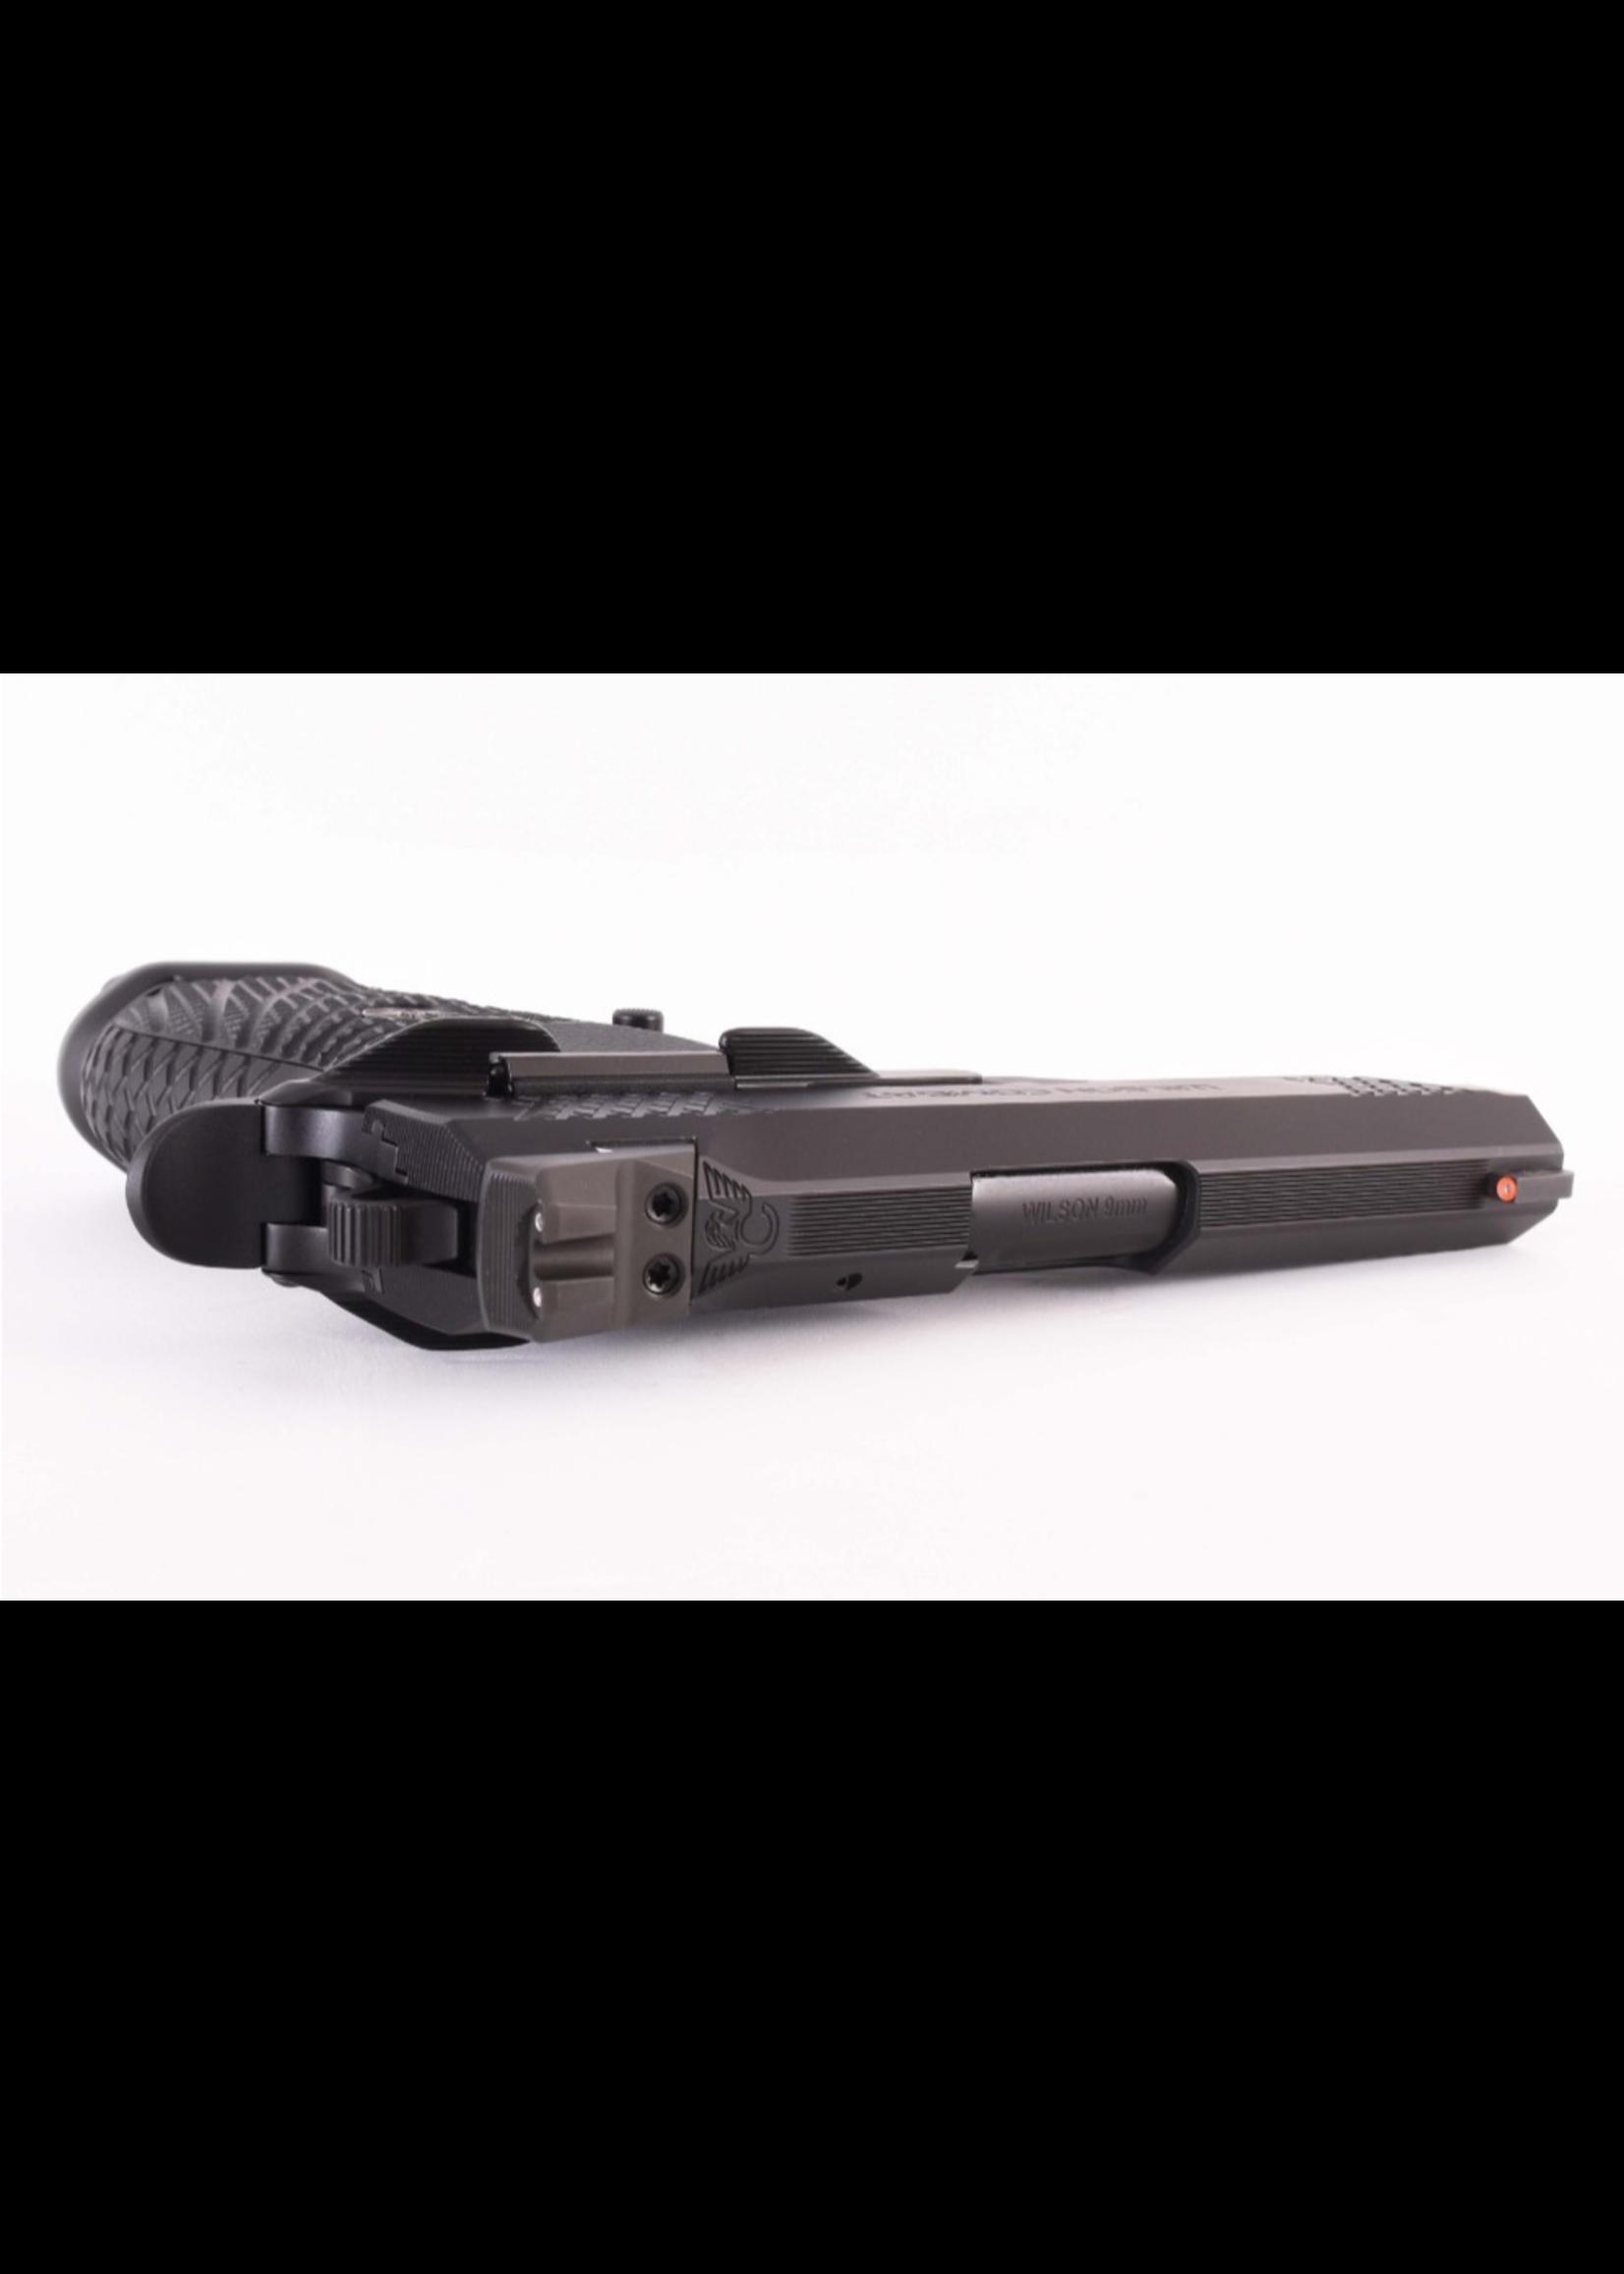 WILSON COMBAT EDC X9 DT Black Edition 9mm Lightrail, Magwell, NS, Ambi